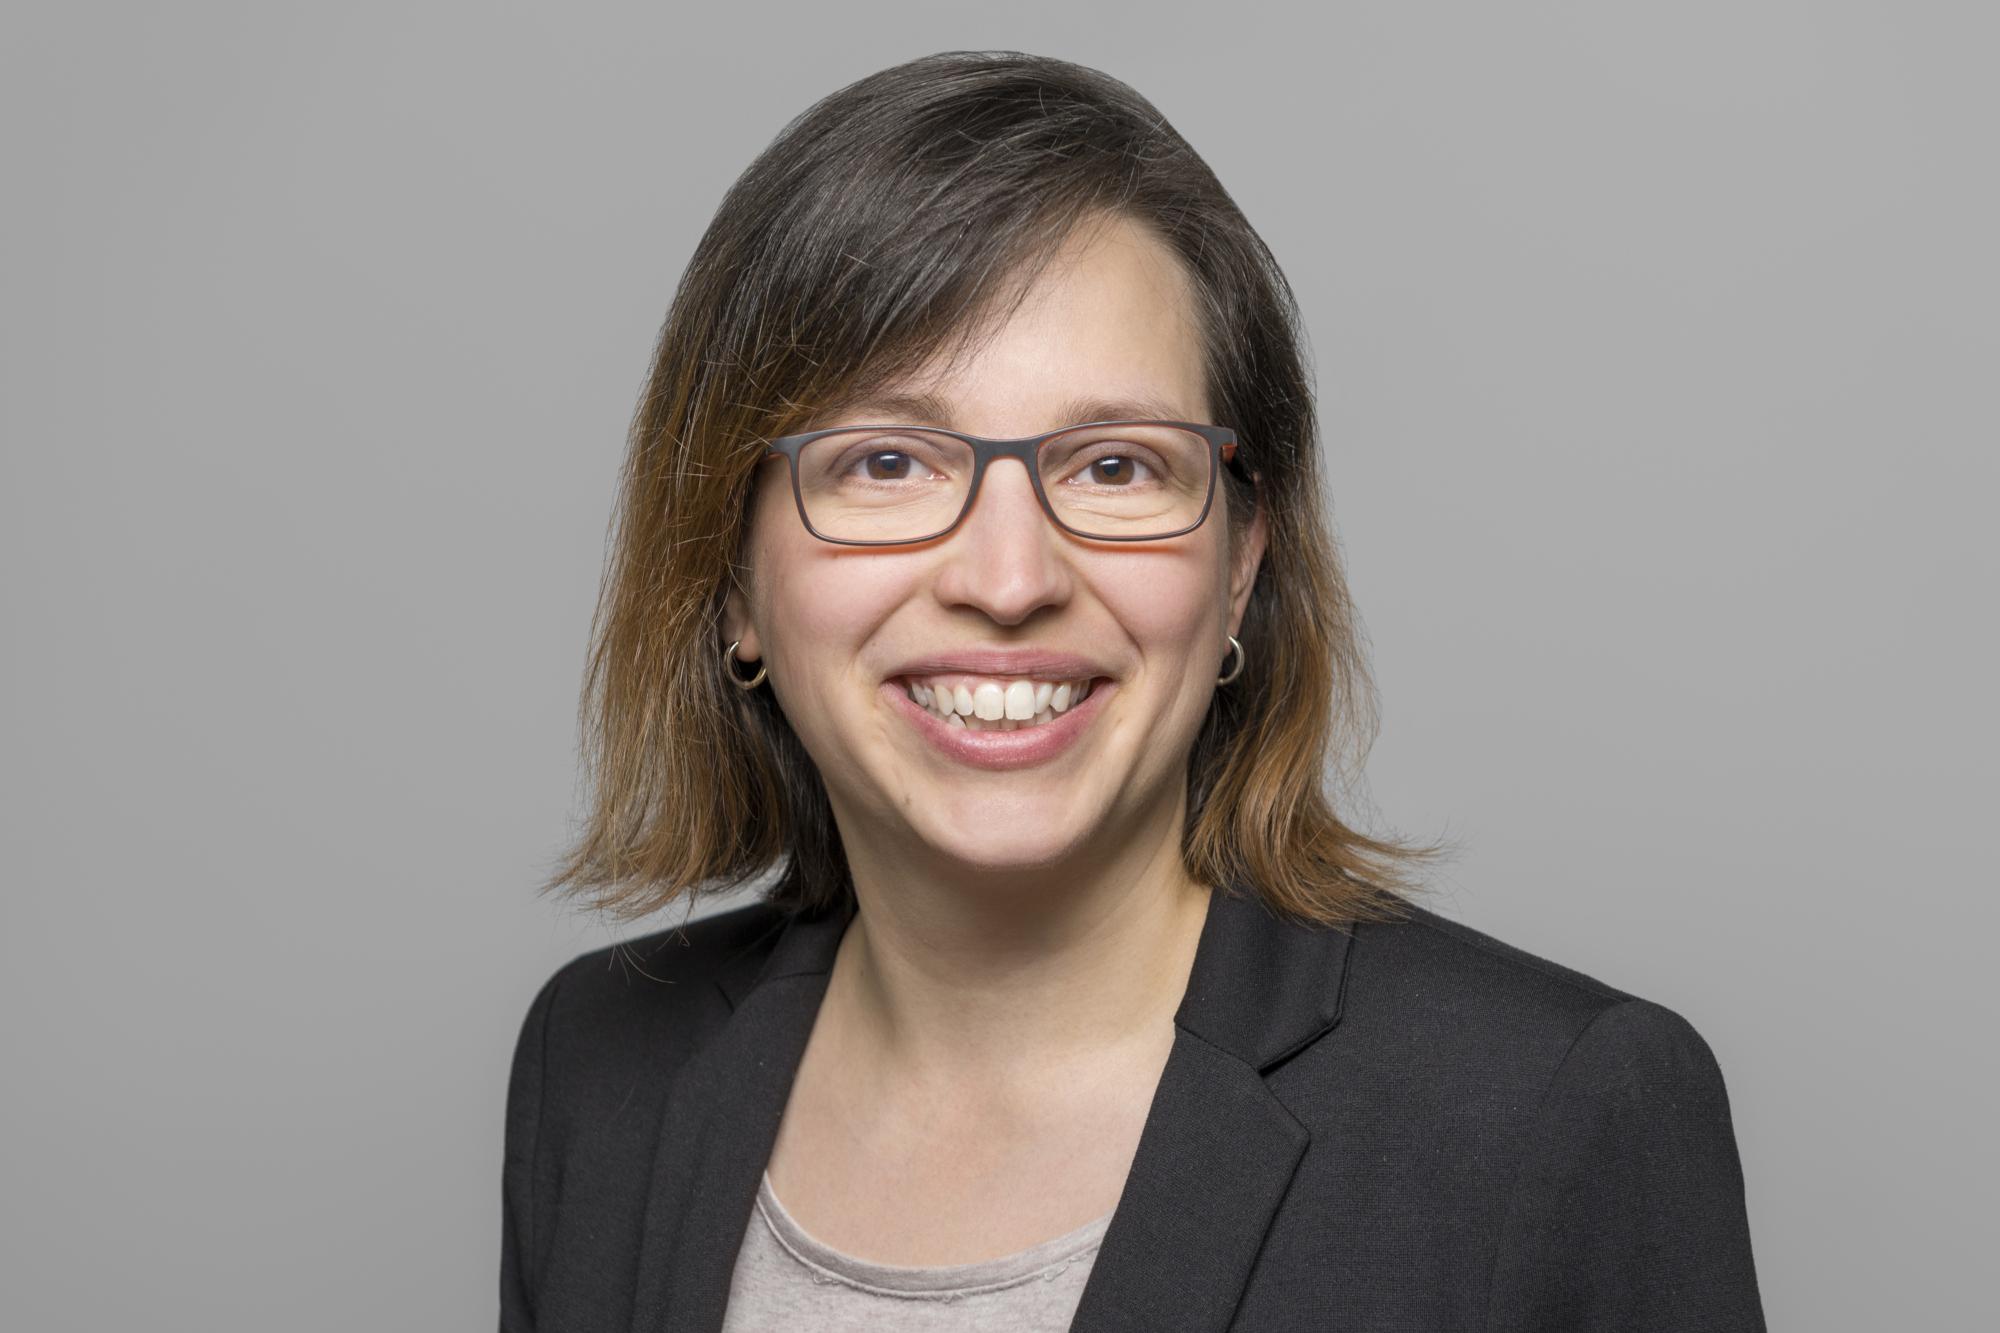 Stefanie Thor